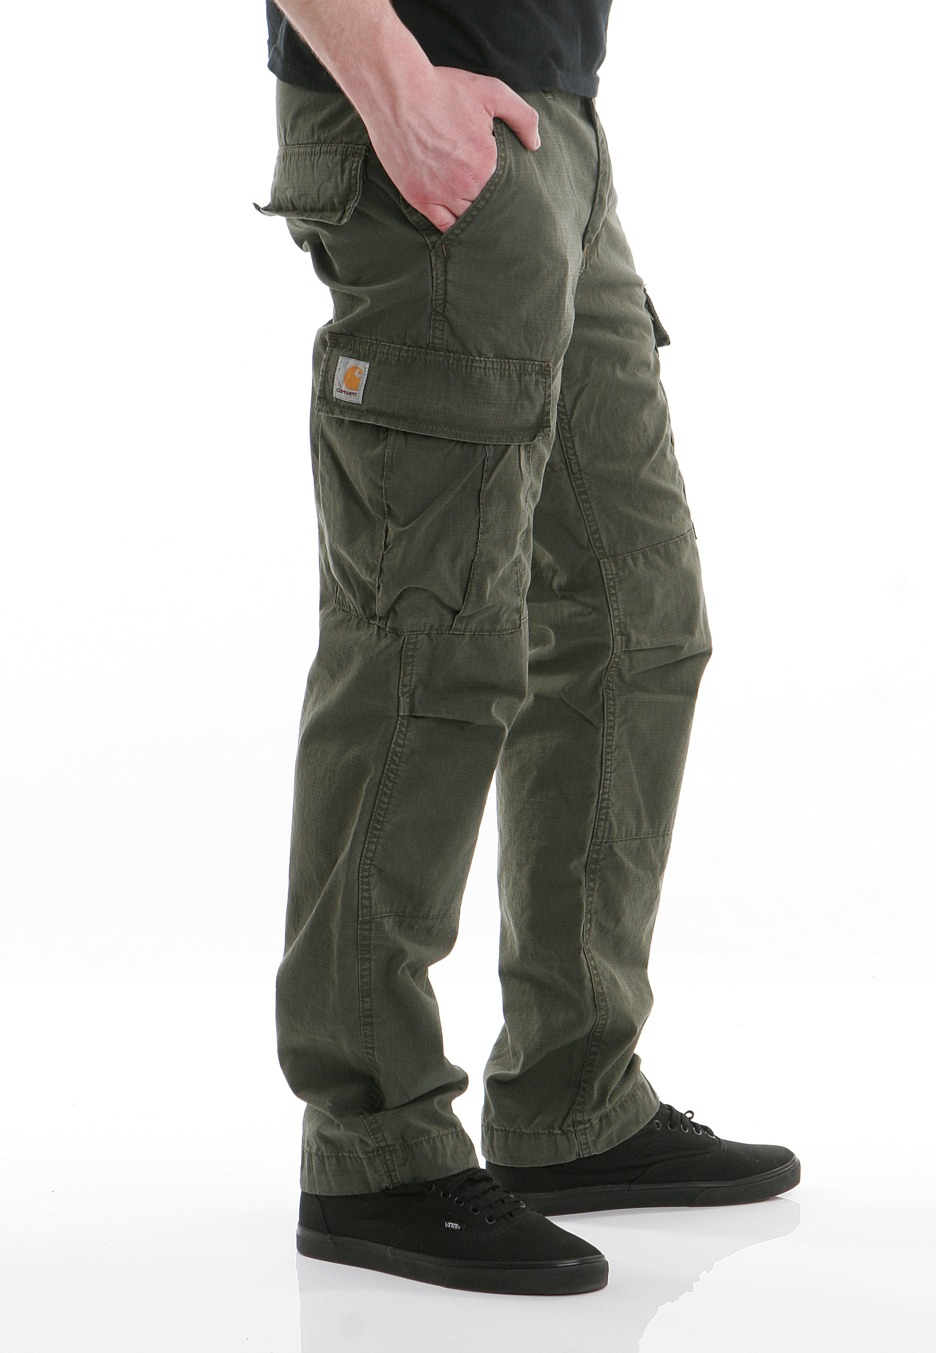 Carhartt WIP - Slim Cargo Columbia Cypress Stone Washed - Byxor - Streetwear Shop - Impericon.com SE